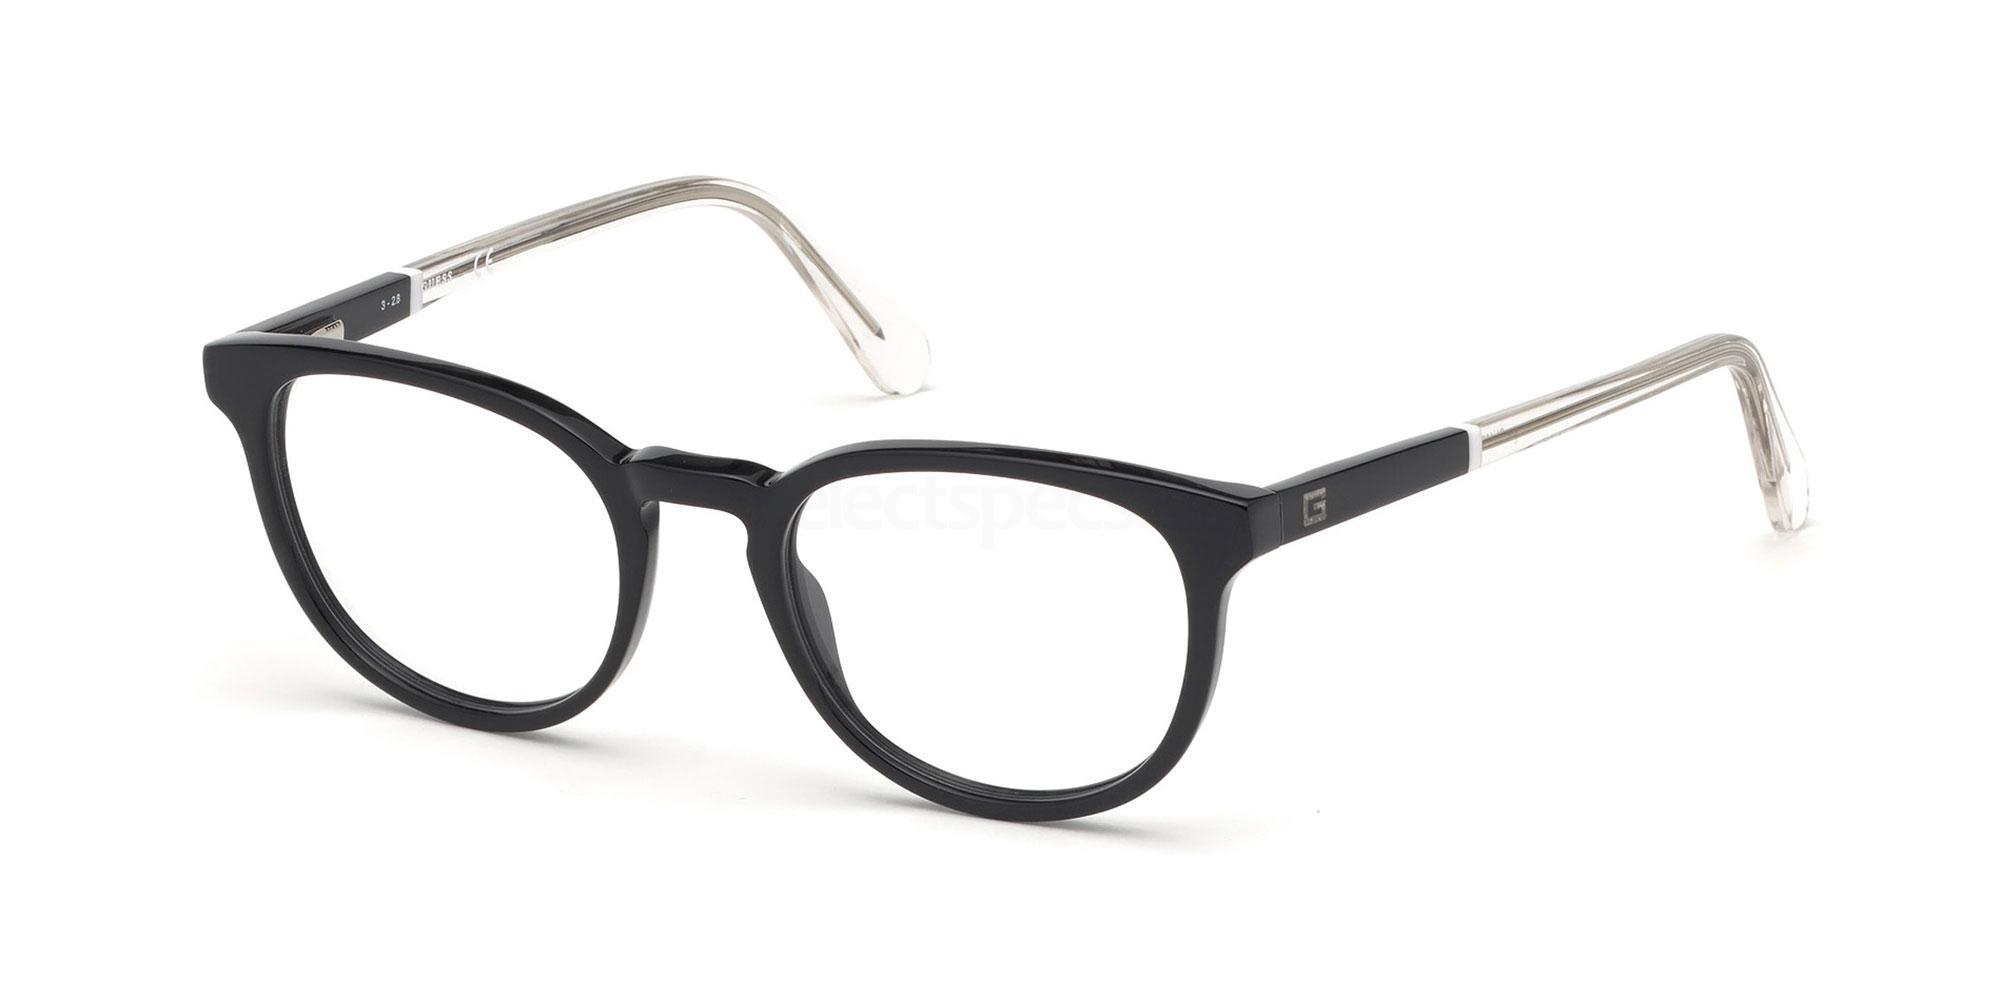 001 GU1973 Glasses, Guess